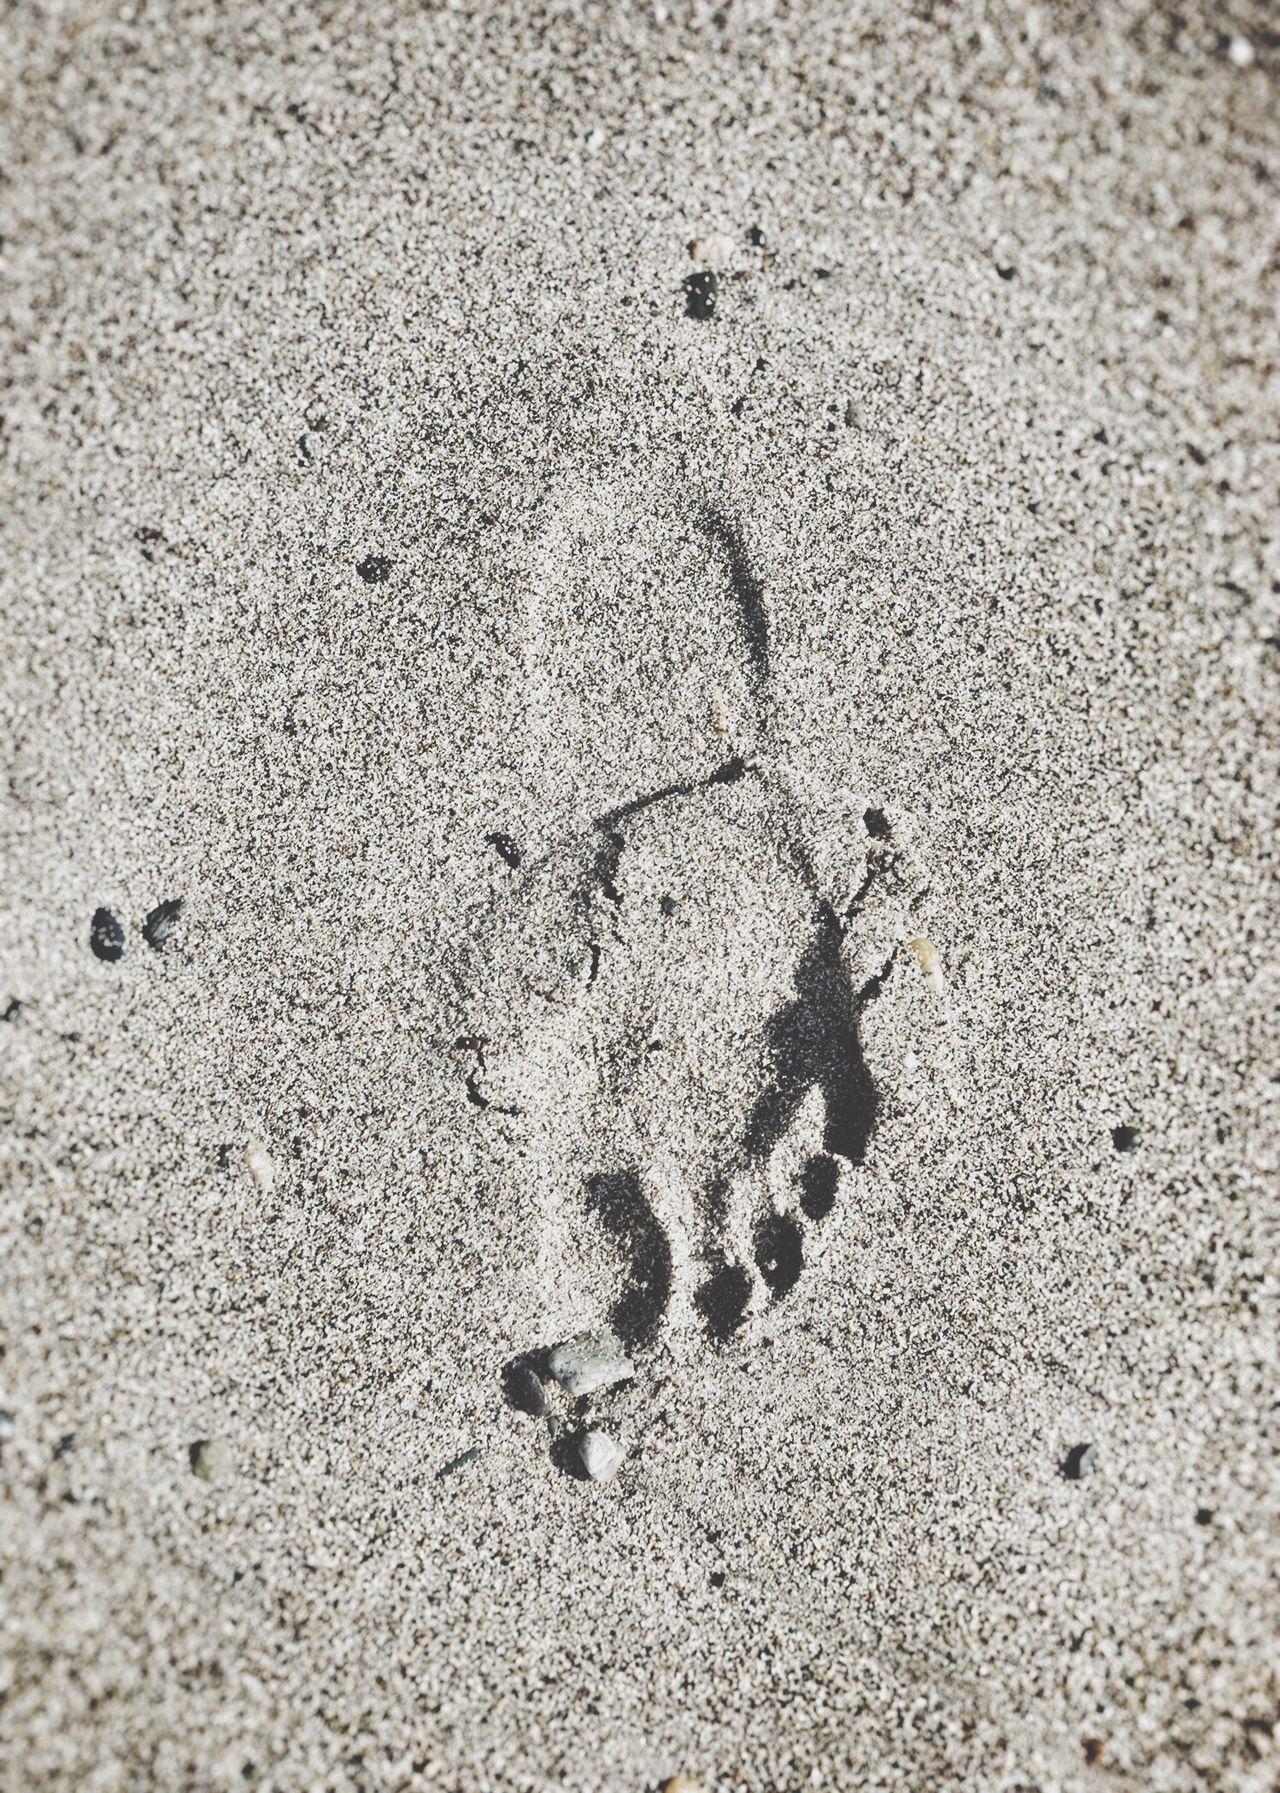 AMTPt_community Sand Beach Nature Memory Time FootPrint Foot Footprints